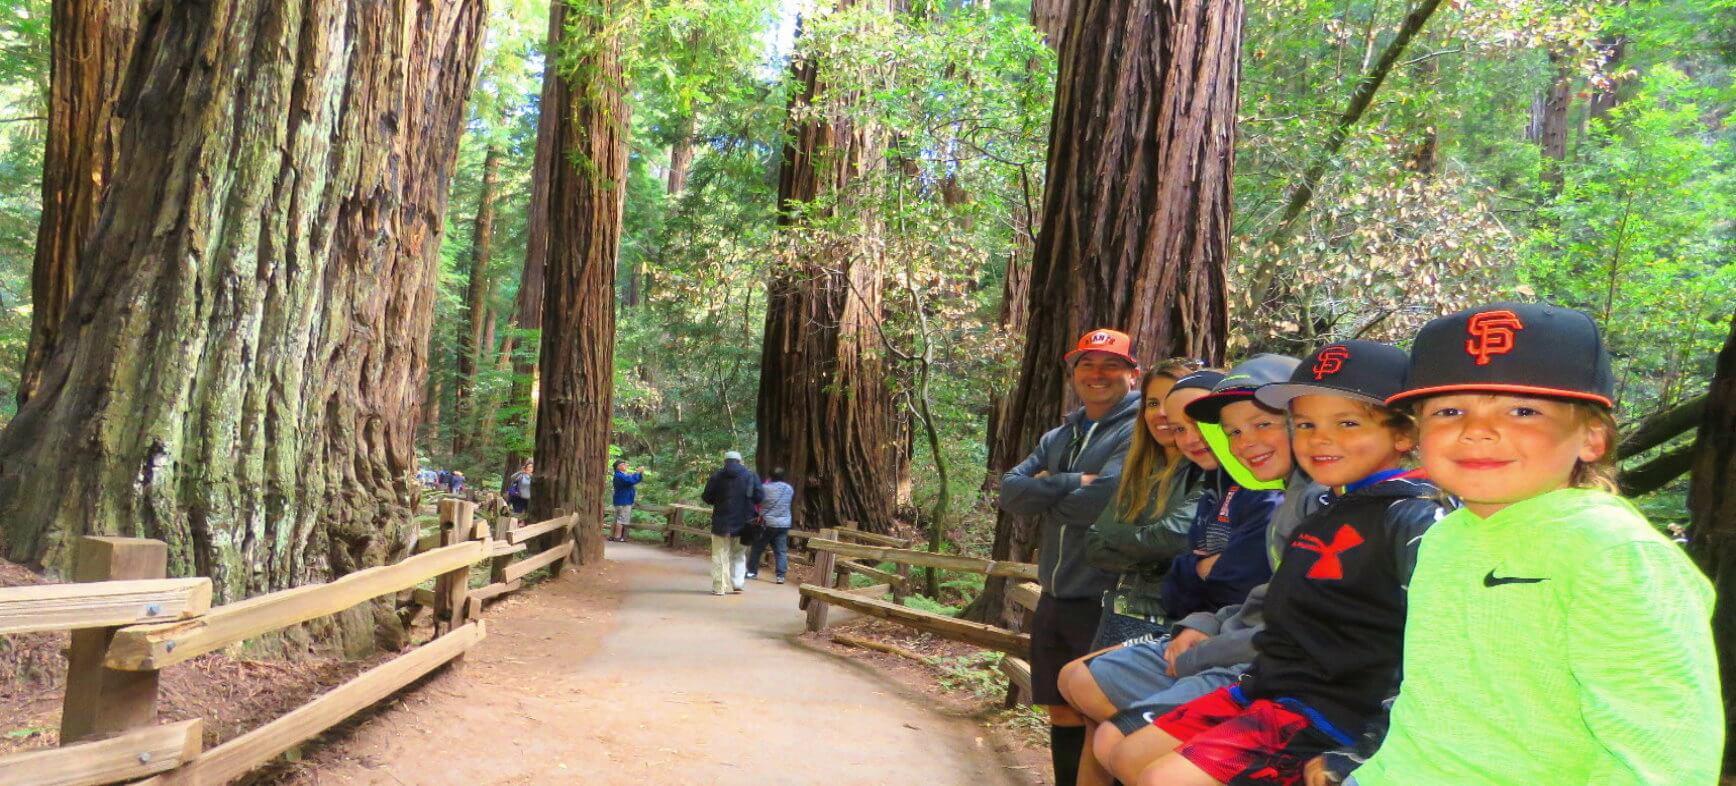 Muir-Woods-Park-Giant-Redwood-Trees